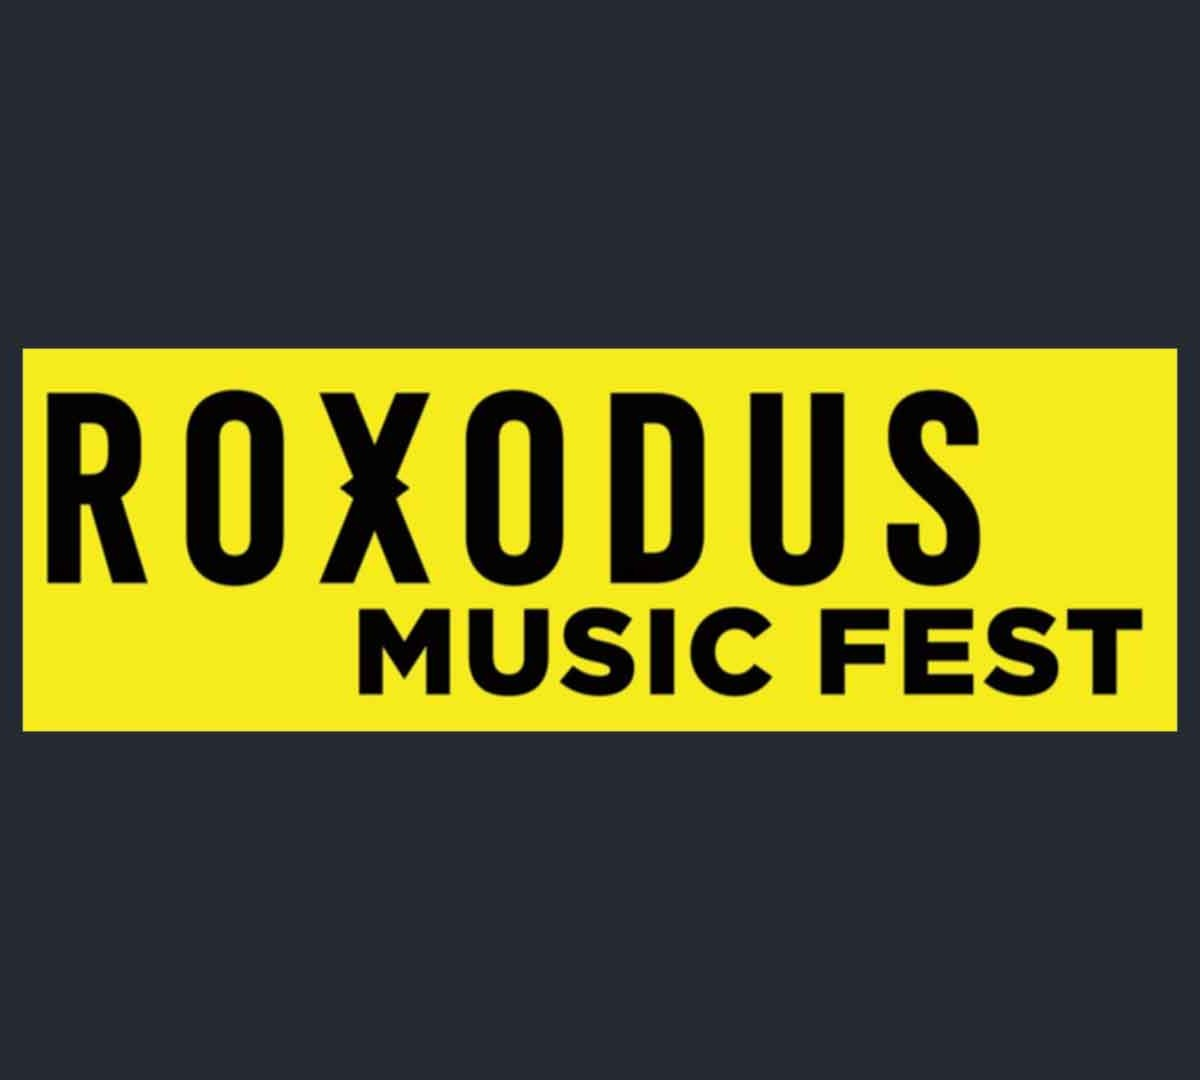 Aerosmith, Lynyrd Skynyrd, Kid Rock, and Nickelback to headline inaugural ROXODUS Festival